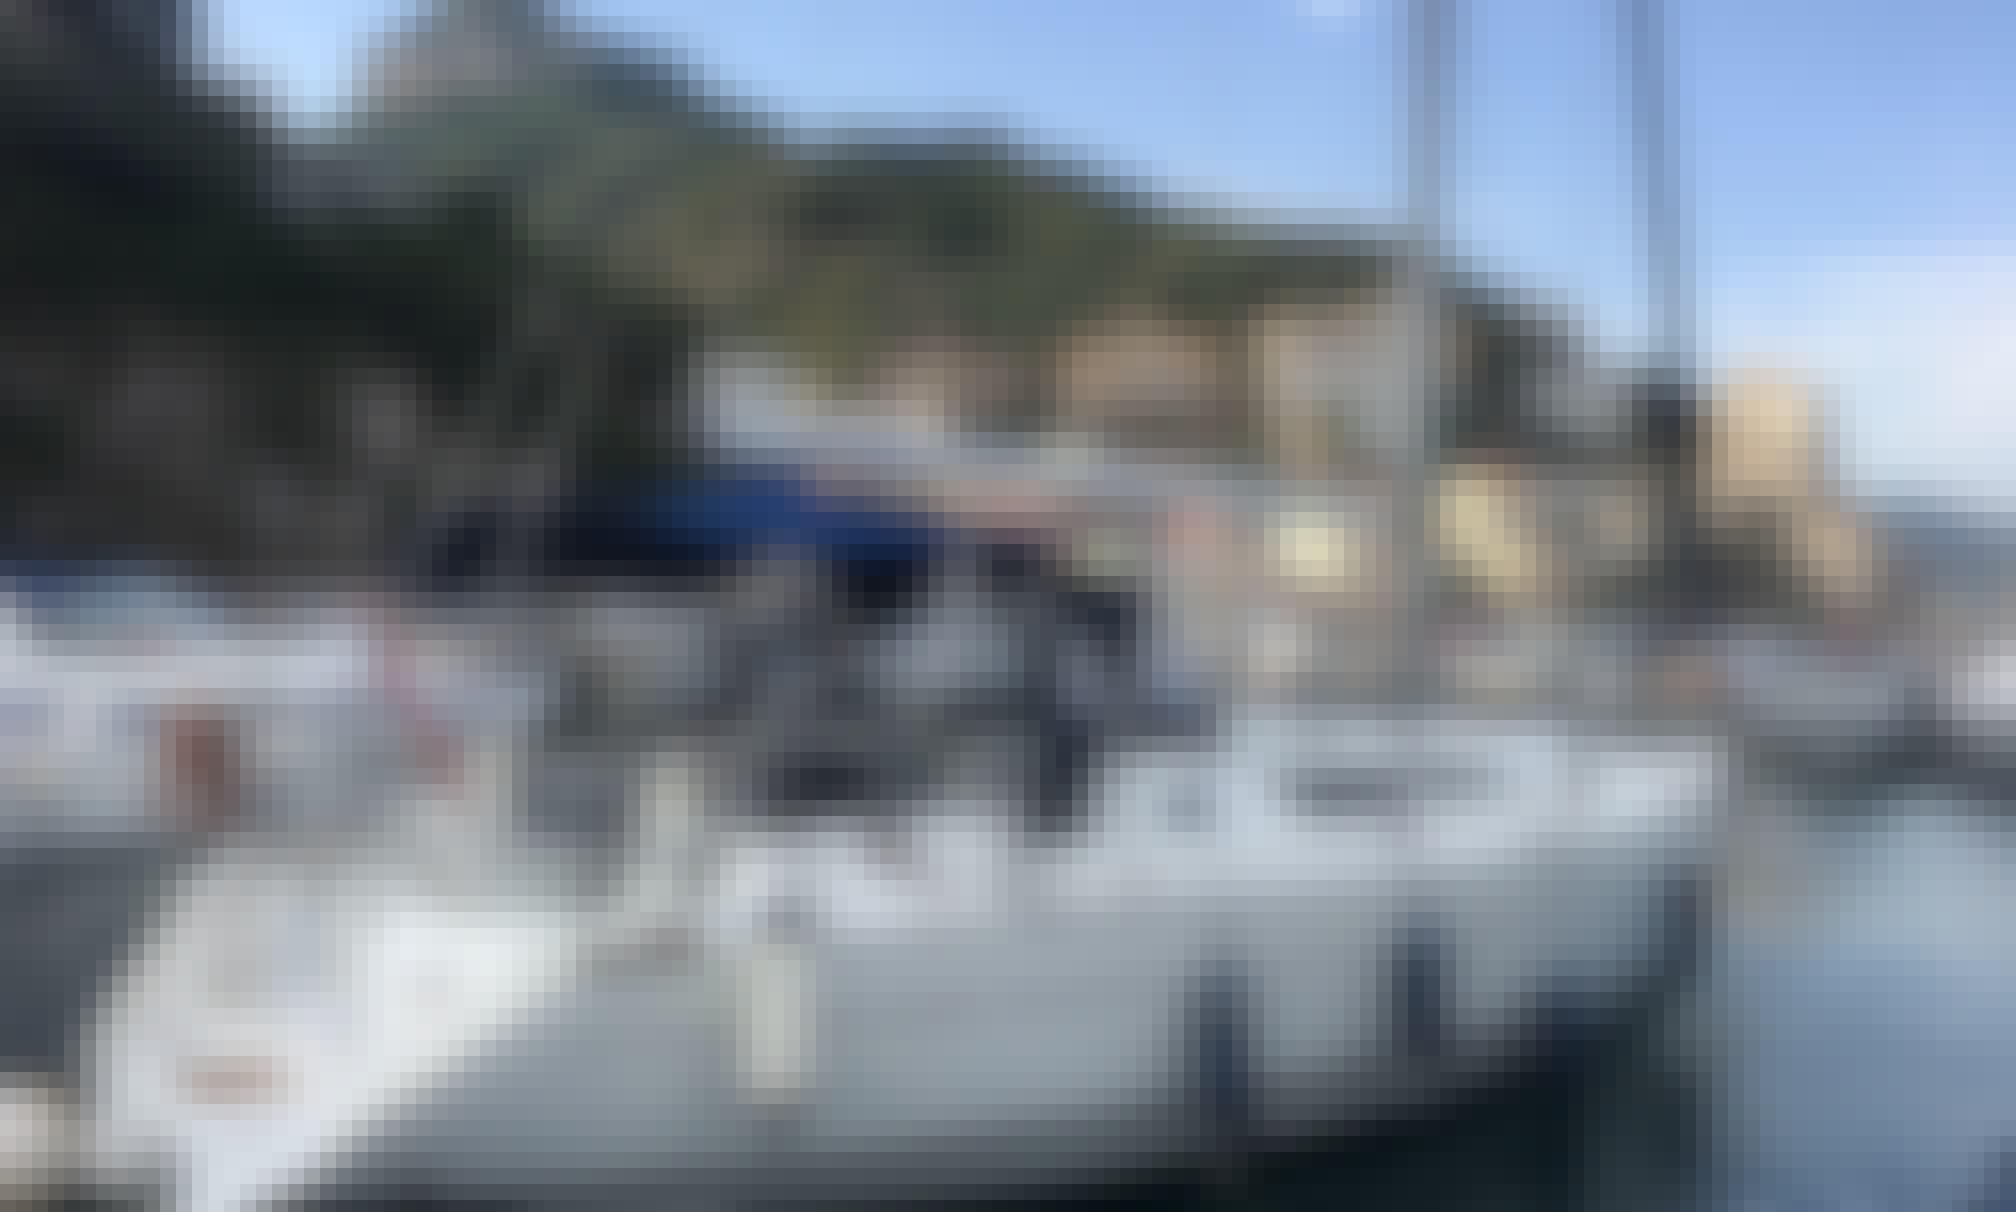 Jeanneau Sun Odyssey 40 Sailboat Charter in Cetara